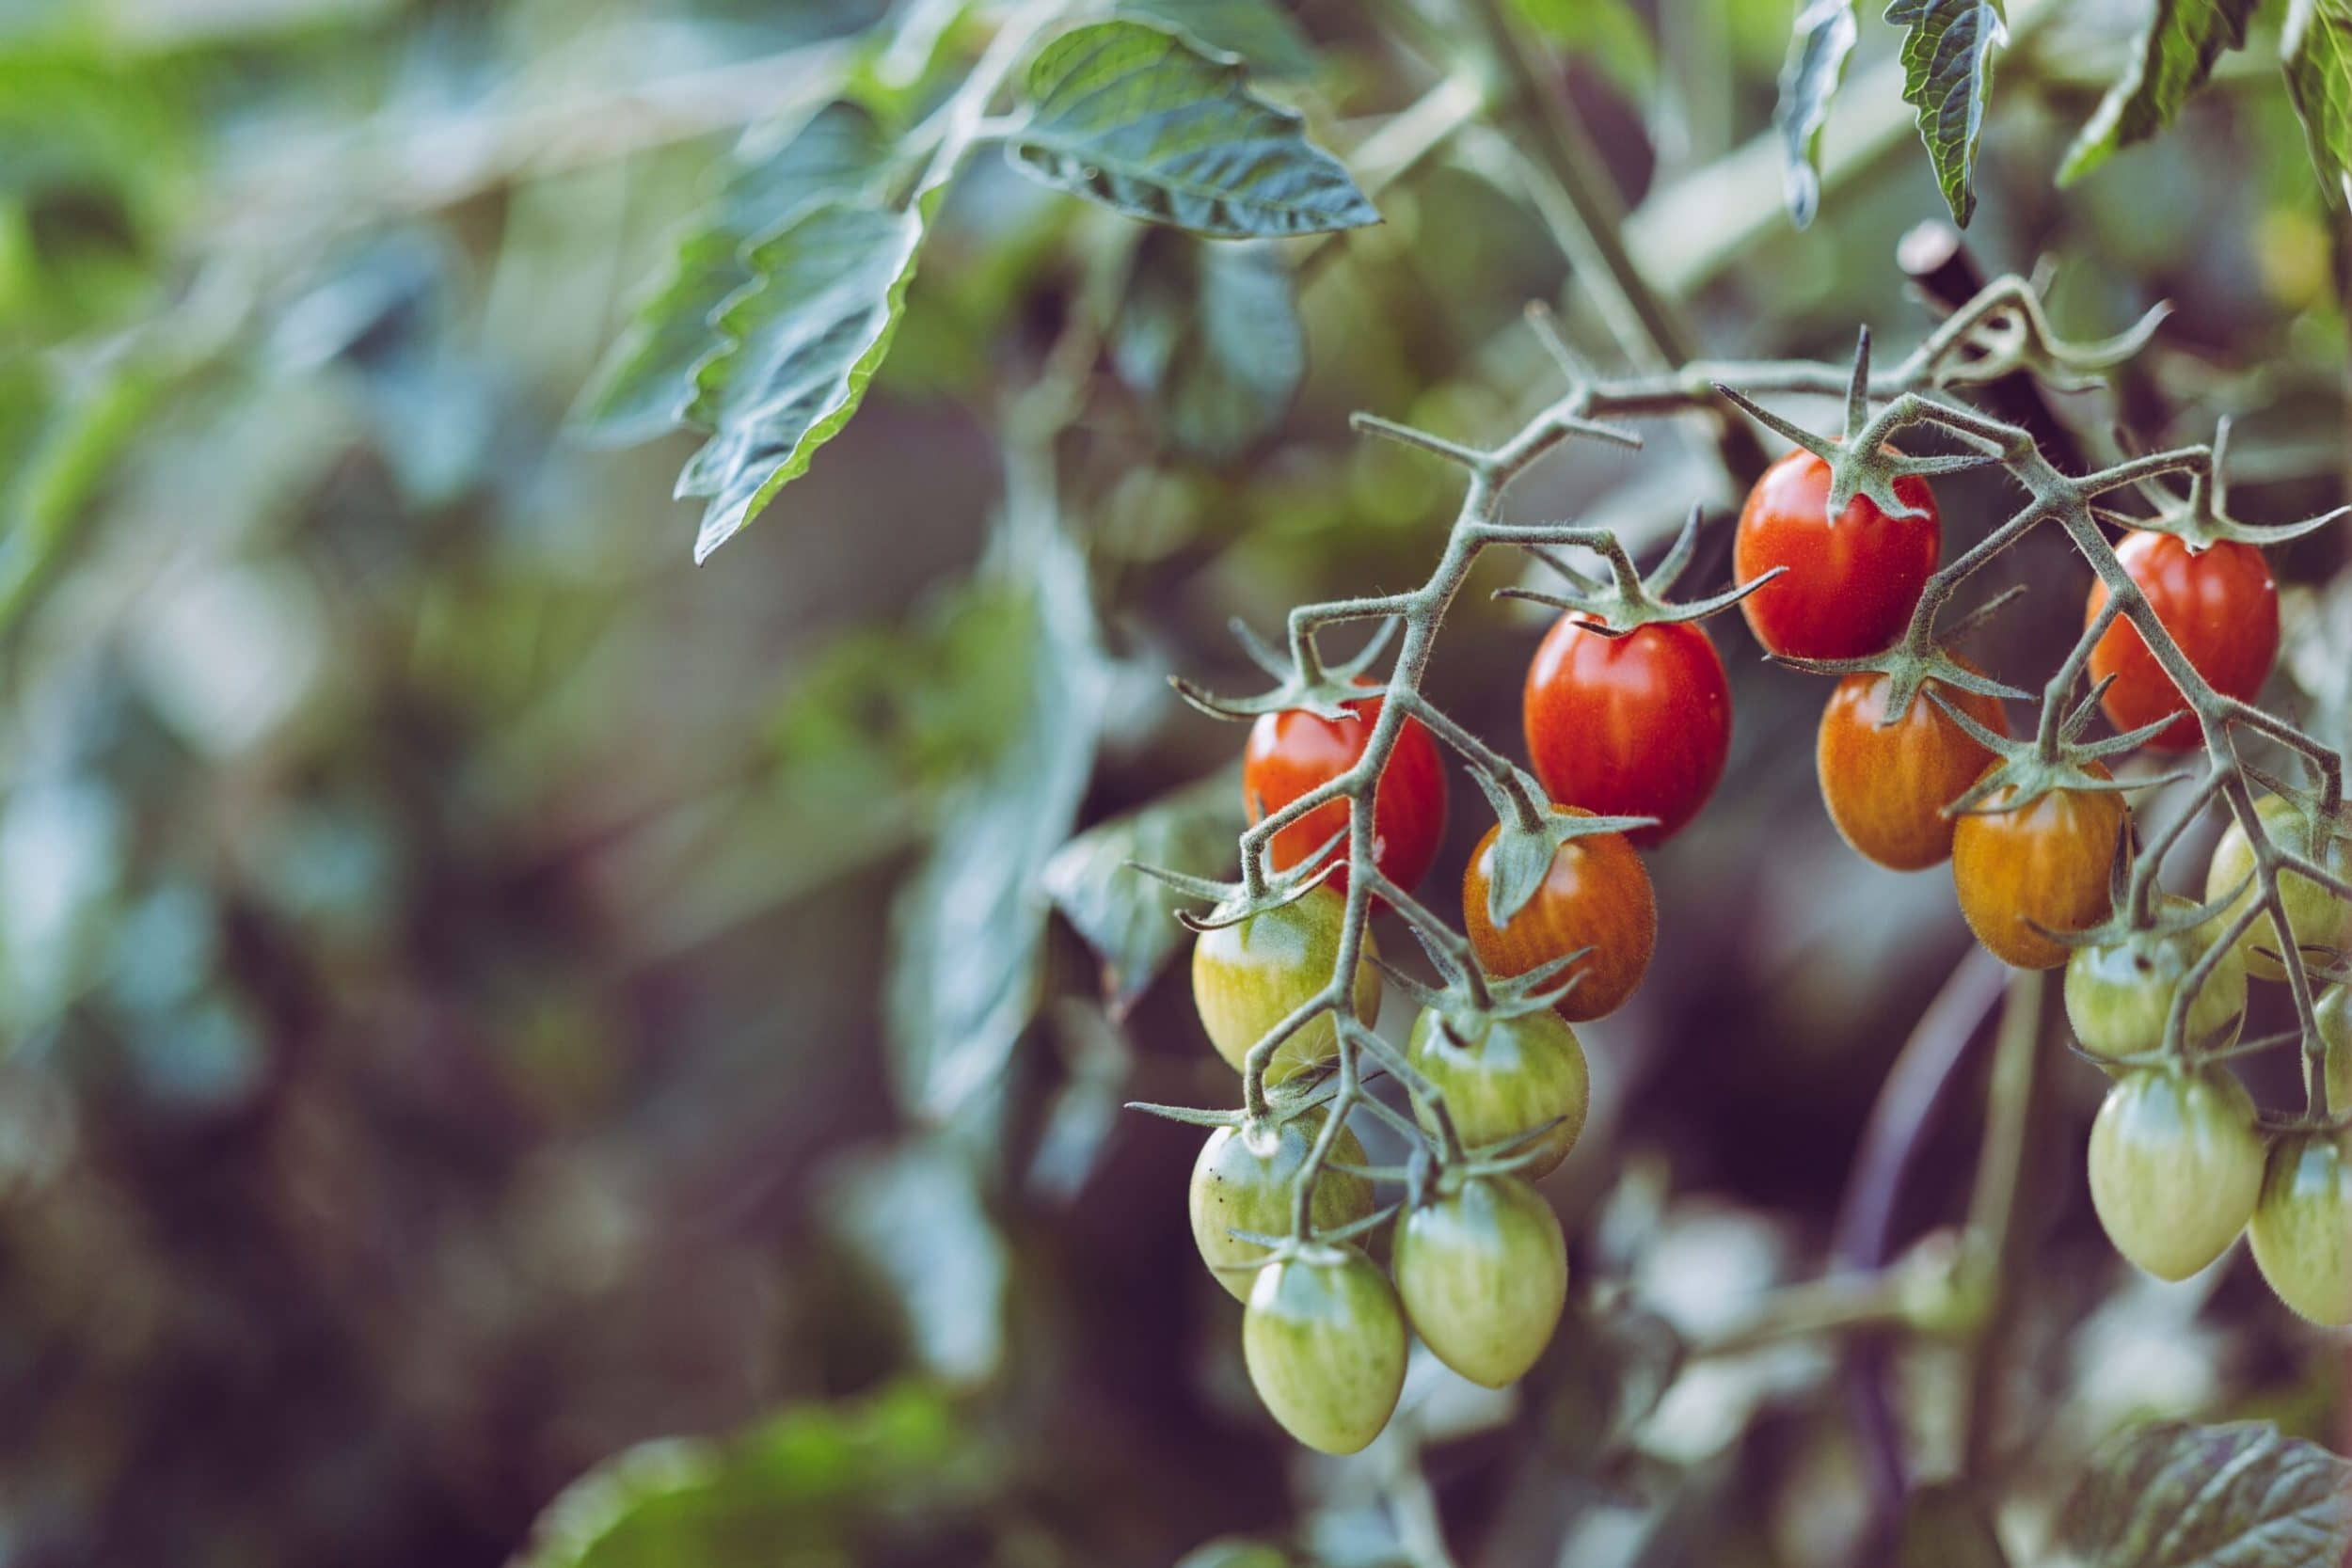 Mejores variedades de tomate para plantar en maceta